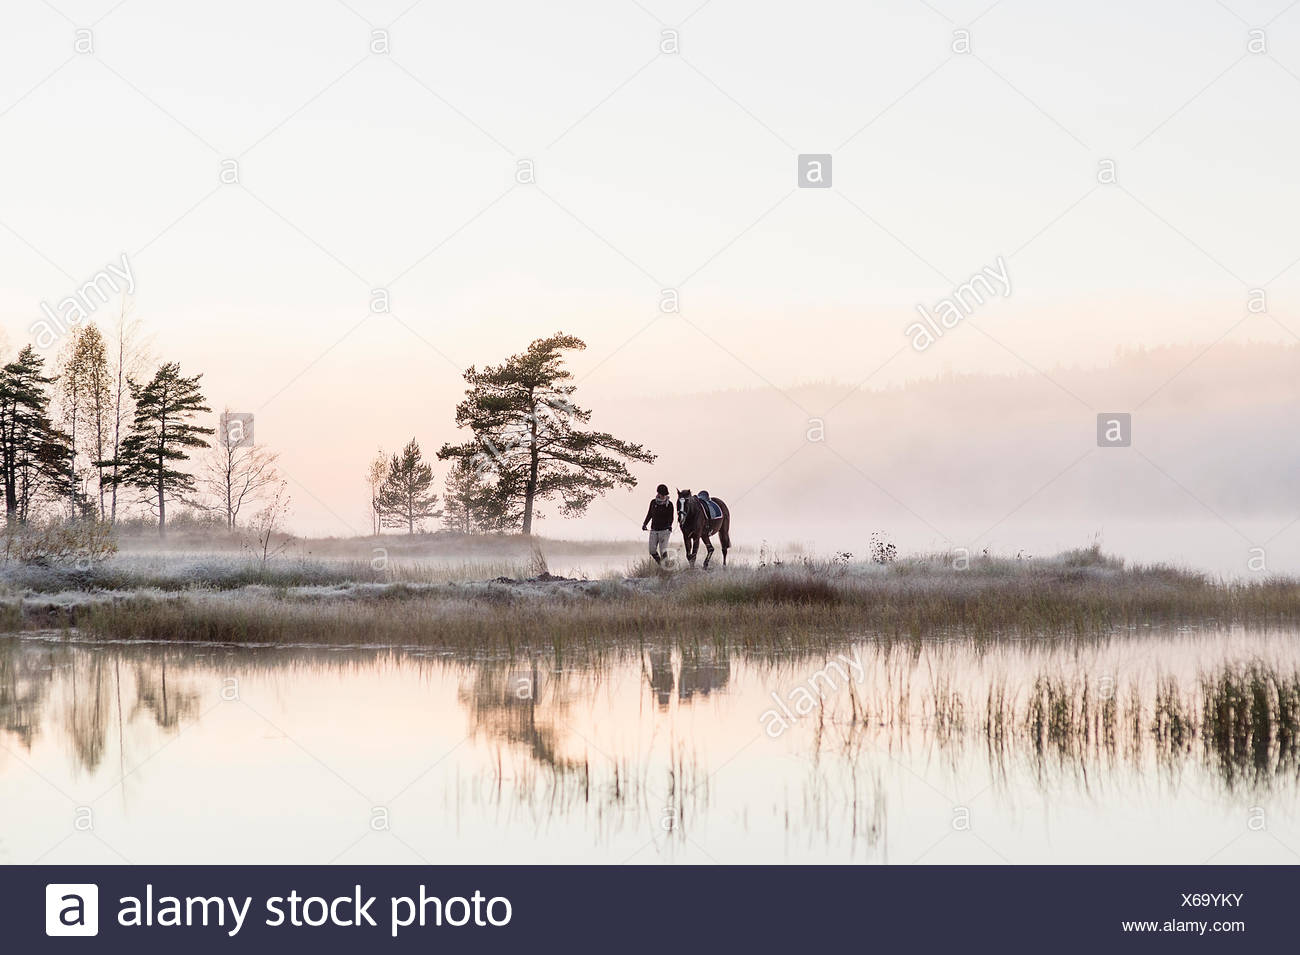 Sweden, Vastmanland, Bergslagen, Hallefors, Grythyttan, Bovik, Young woman walking with horse along lake shore - Stock Image